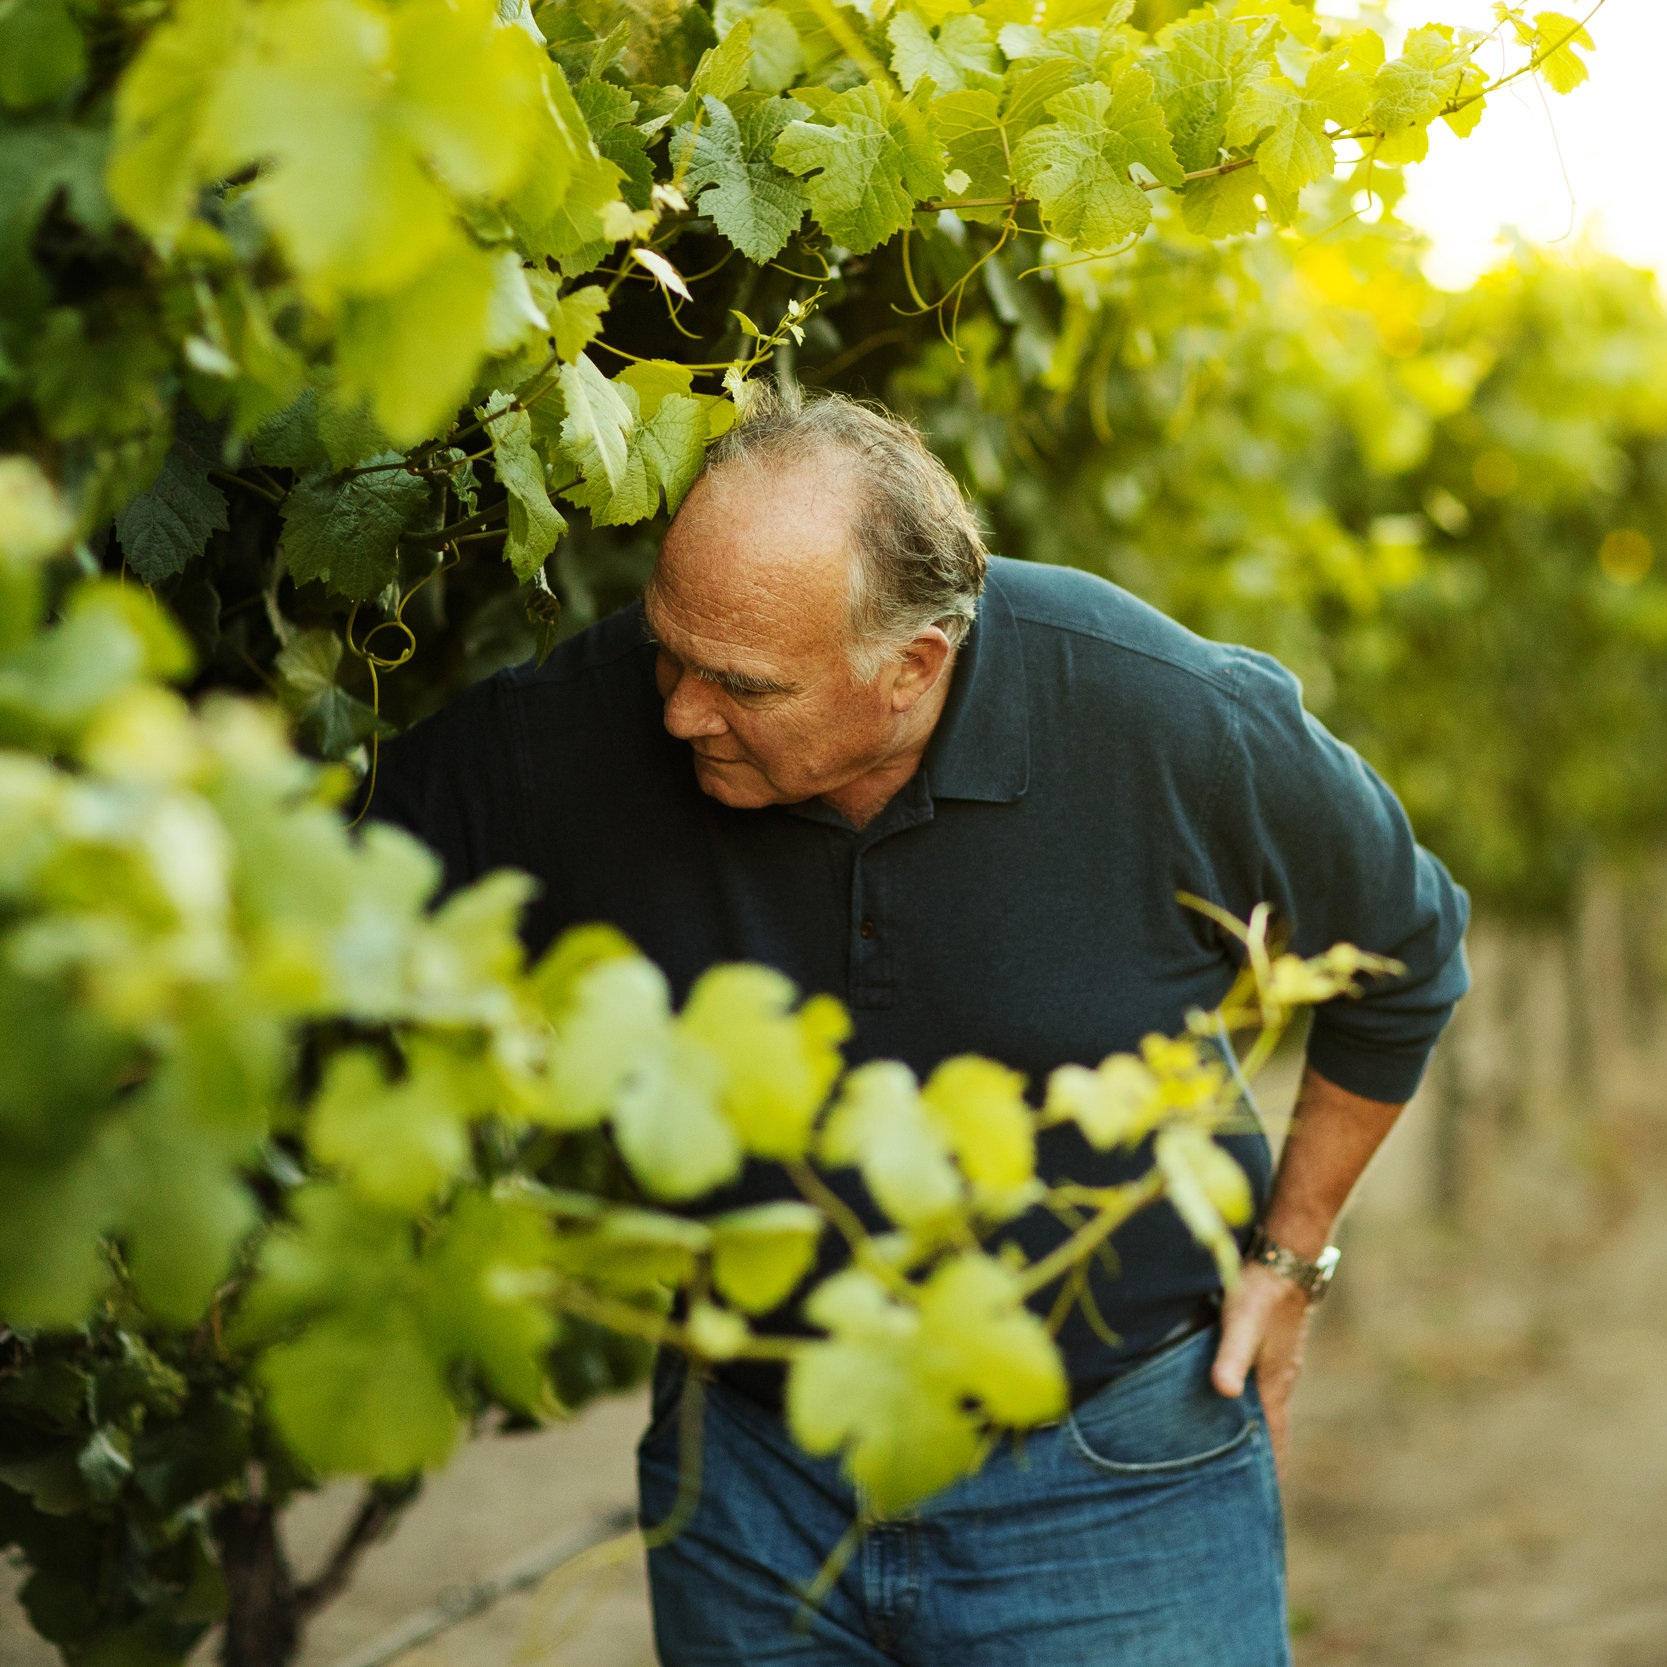 John_checking_on_the_grapes.jpg